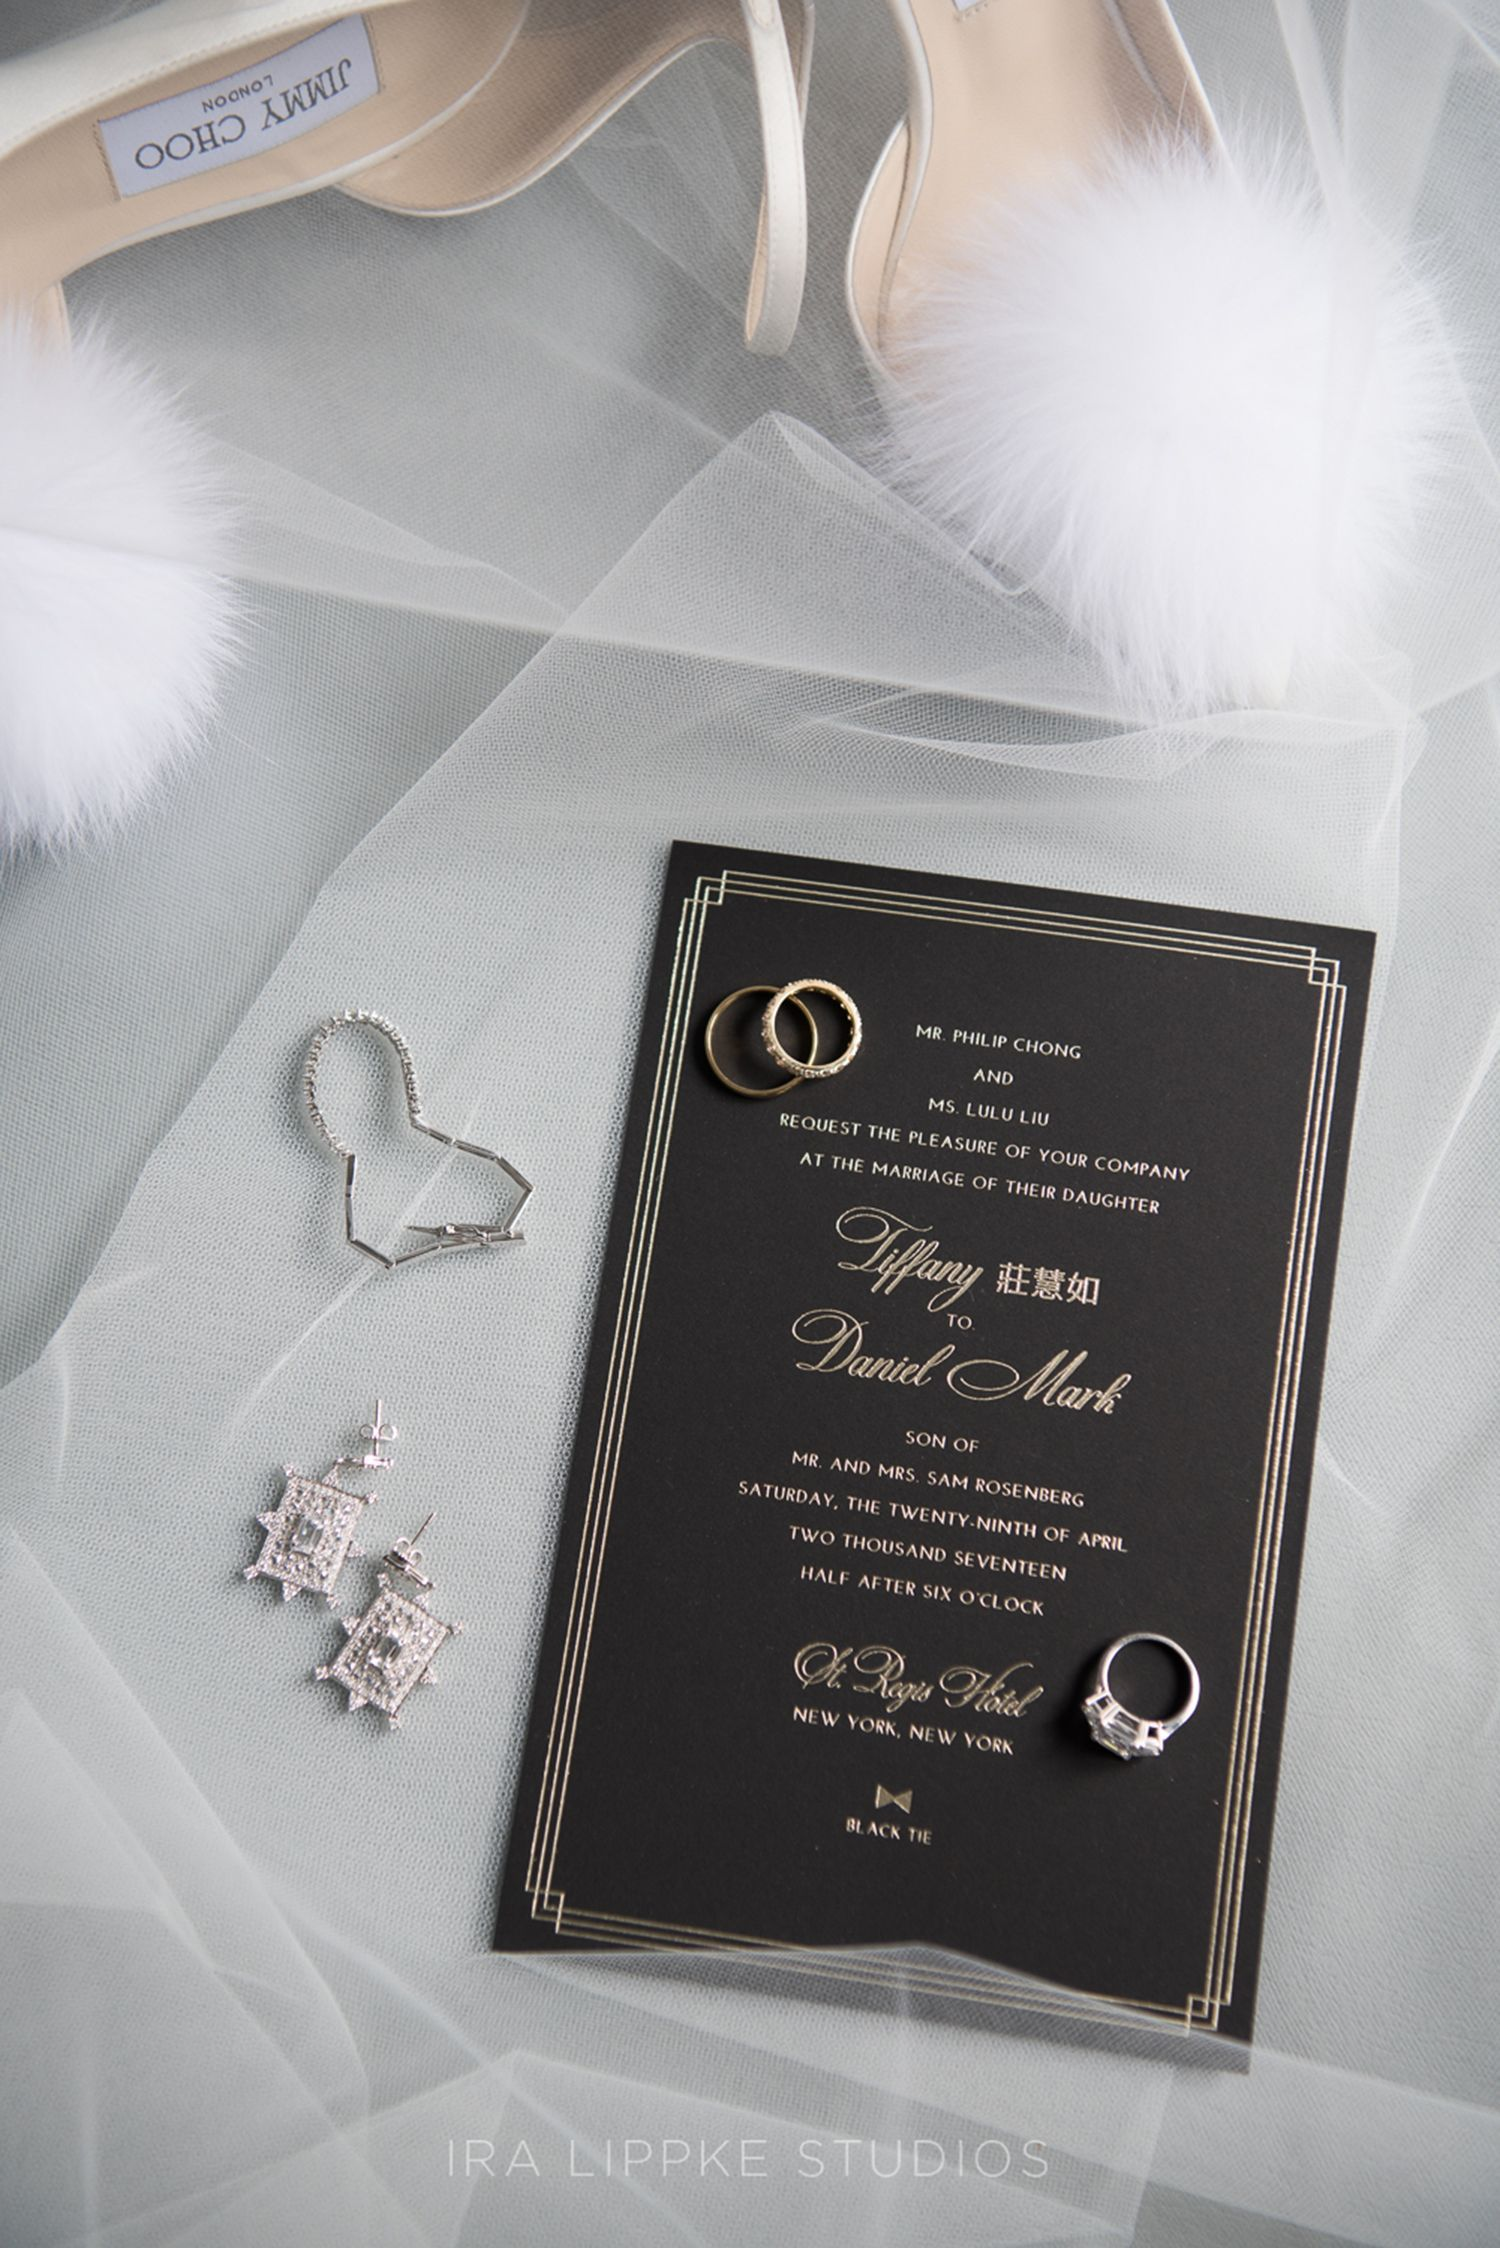 Timeless and Glamorous St. Regis Hotel Wedding in New York City ...